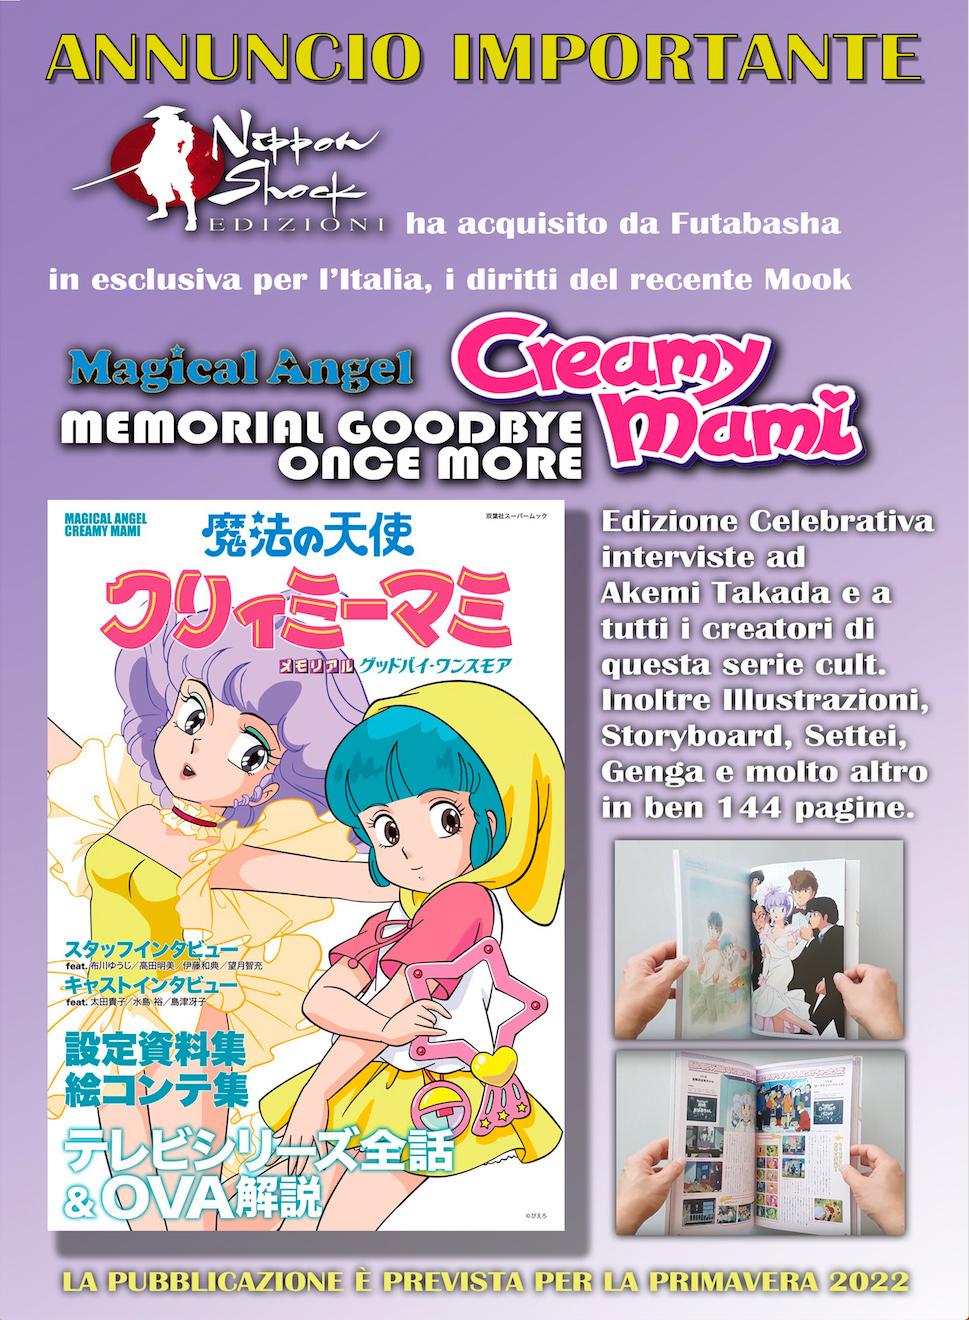 Creamy Mami: Memorial Goodbye Once More arriverà in Italia